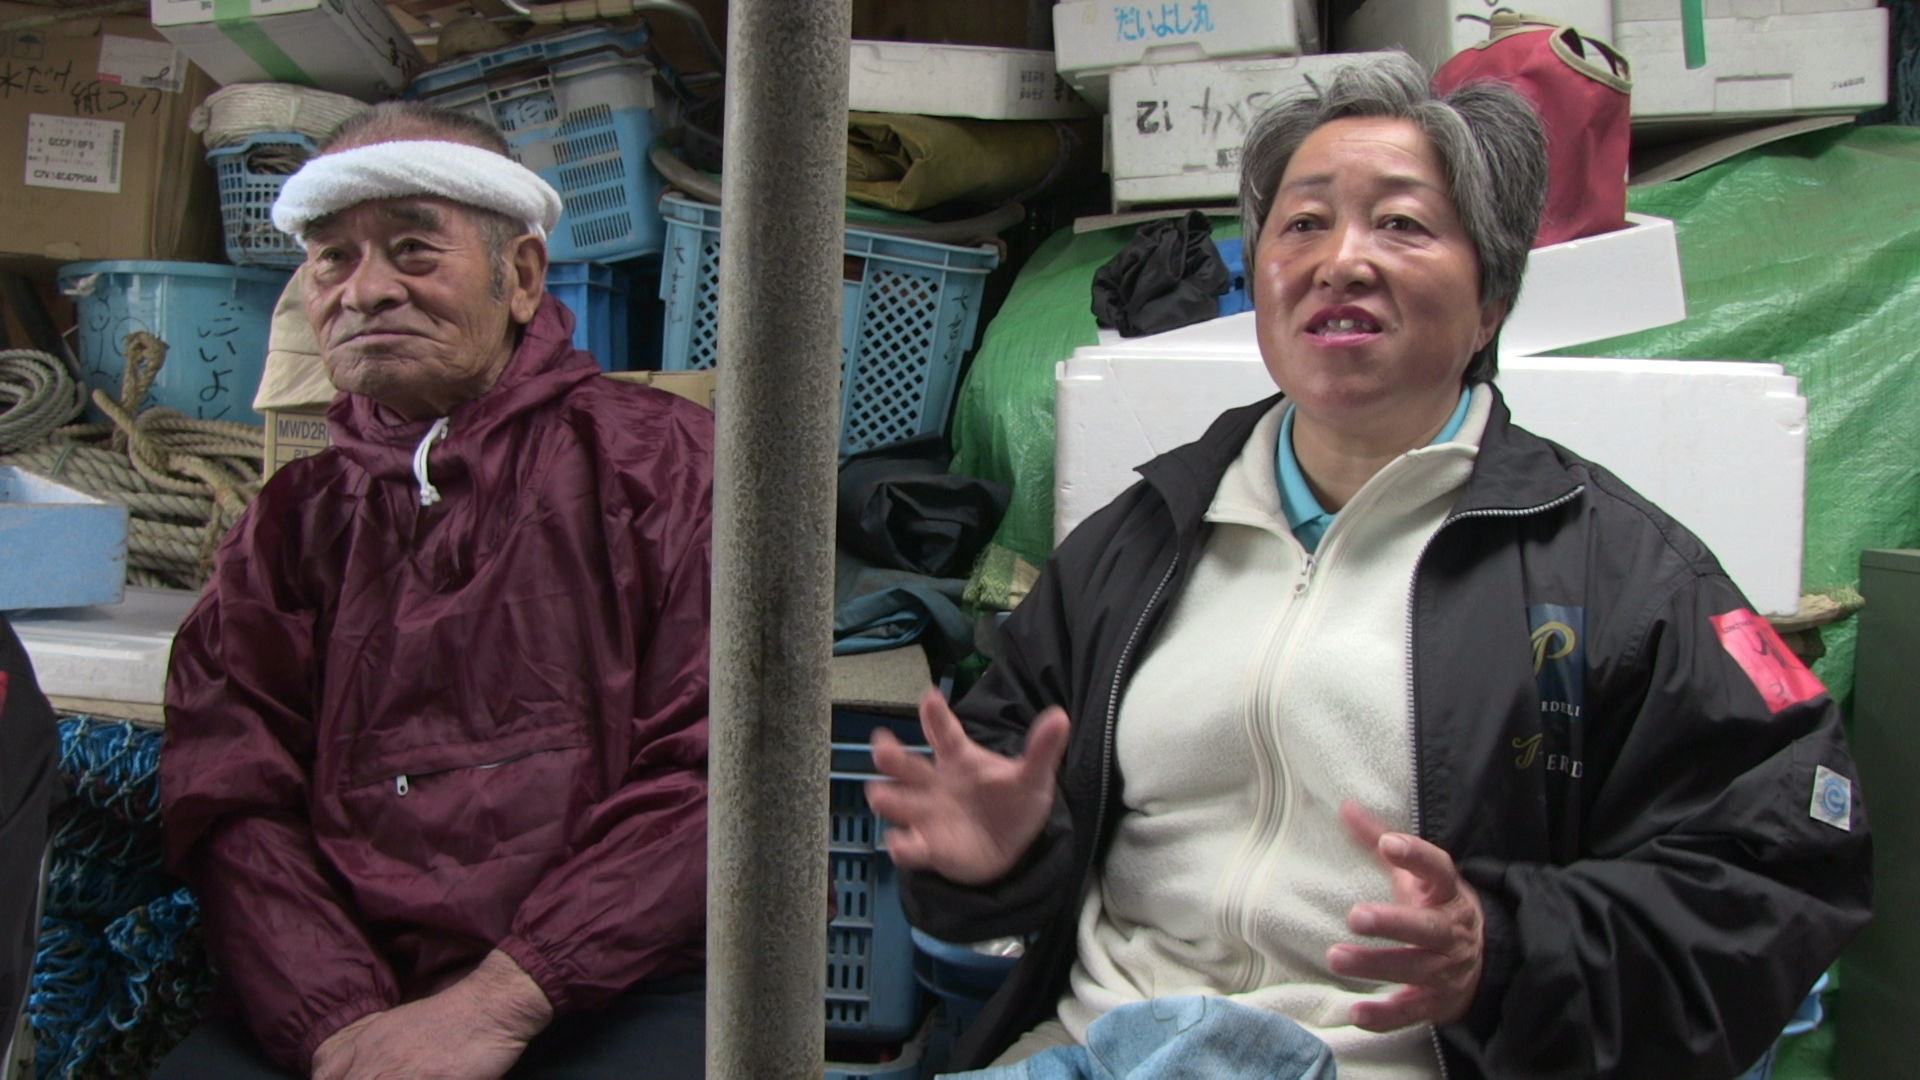 arahama kato and daughter interview.JPG